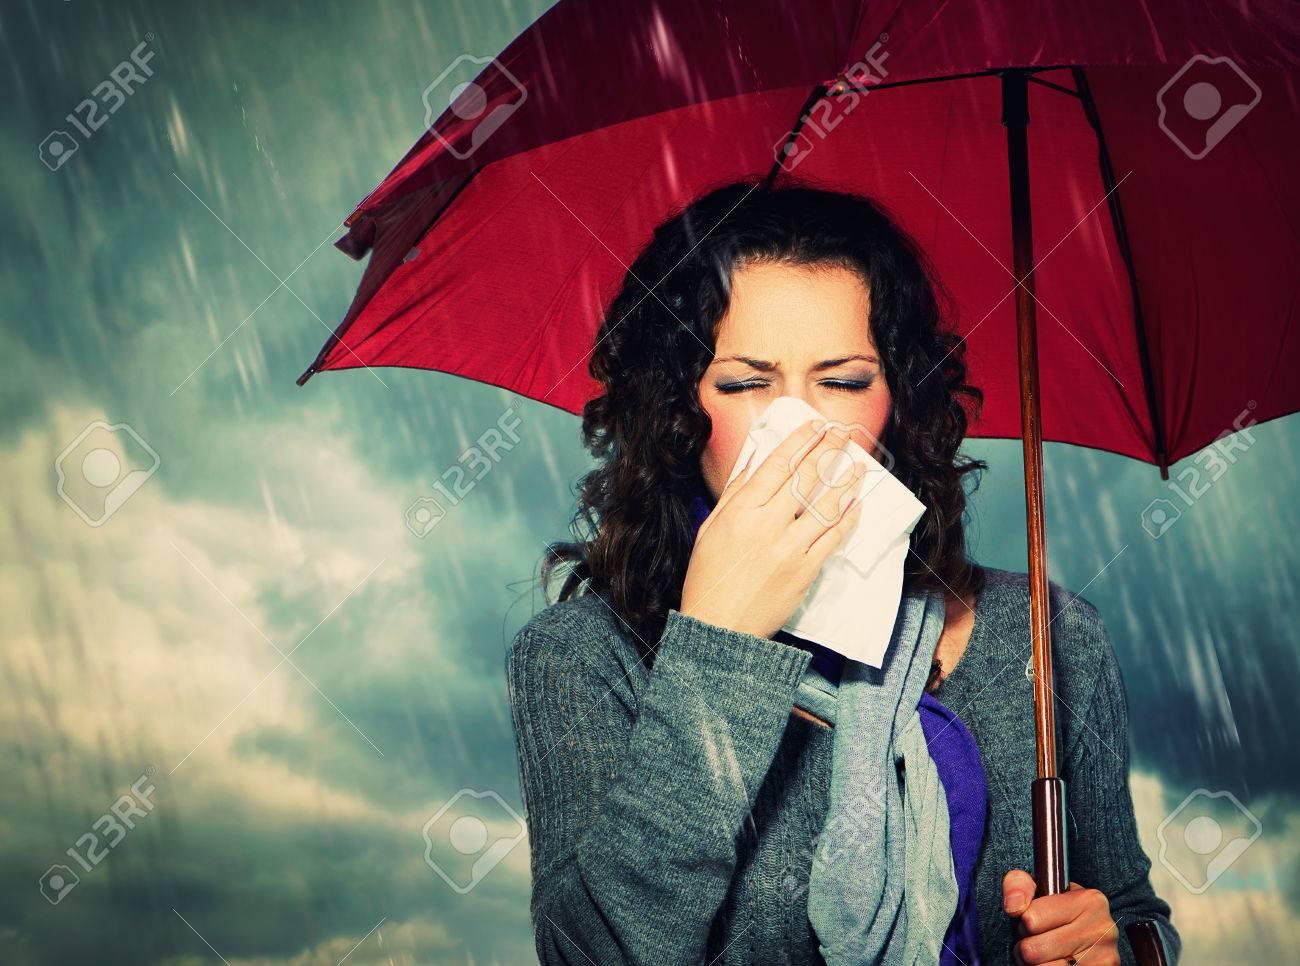 e248be6f77548 Sneezing Woman with Umbrella over Autumn Rain Background Stock Photo -  22783587